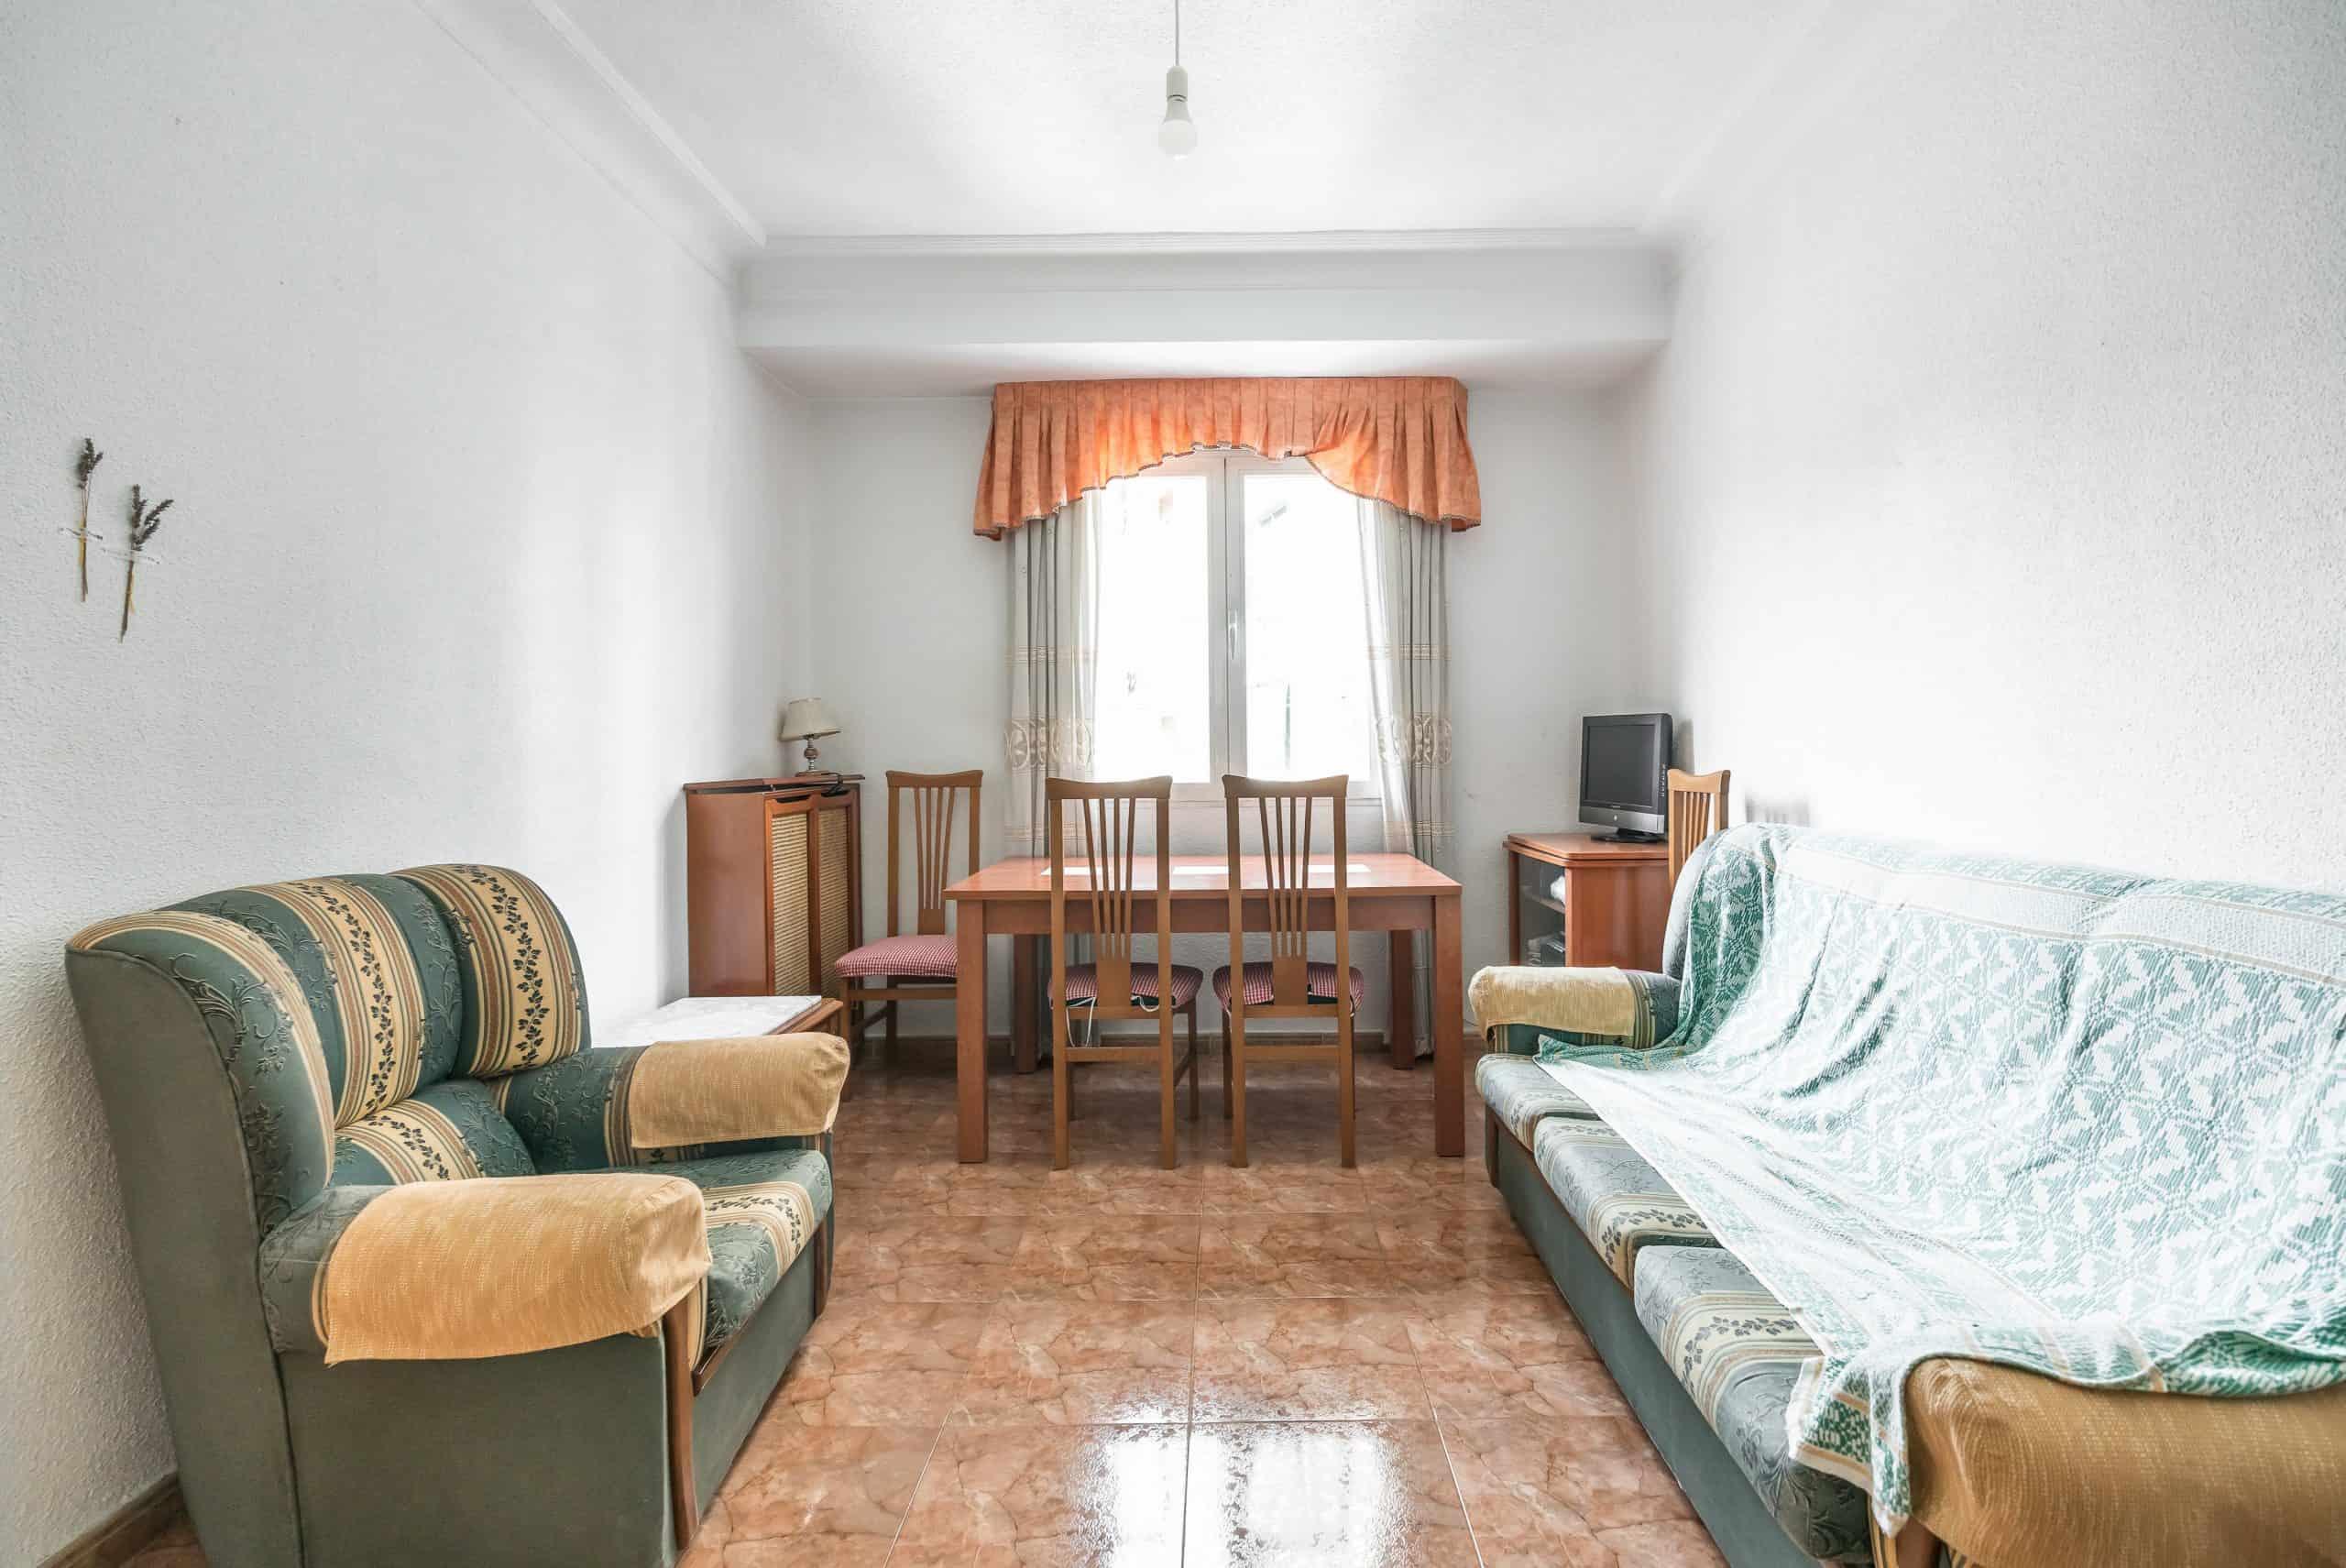 Agencia Inmobiliaria de Madrid-FUTUROCASA-calle Embajadores-Chopera-Arganzuela1 SALON (2)